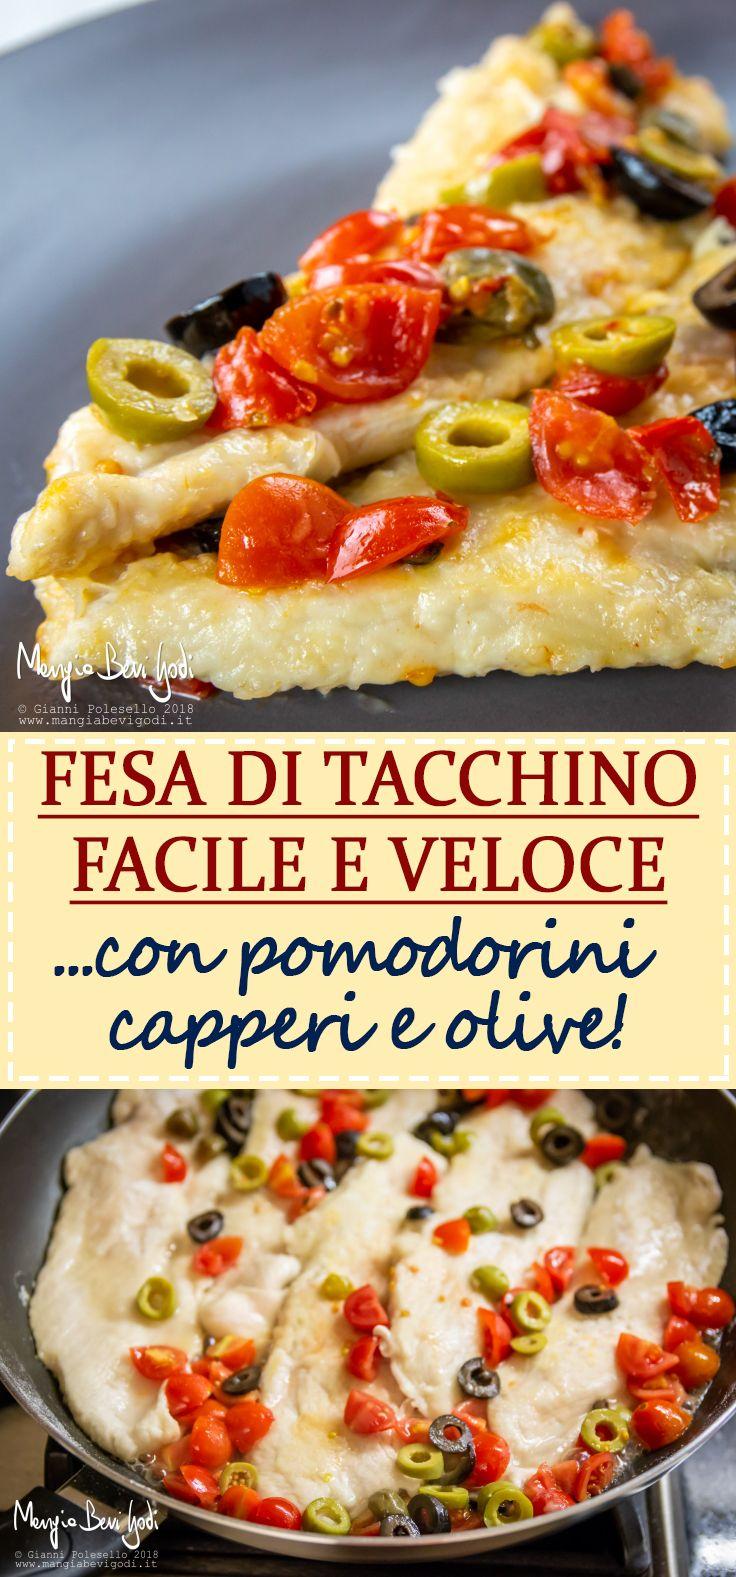 926fd9ef97fe01437052048812aa091a - Fesa Di Tacchino Ricette